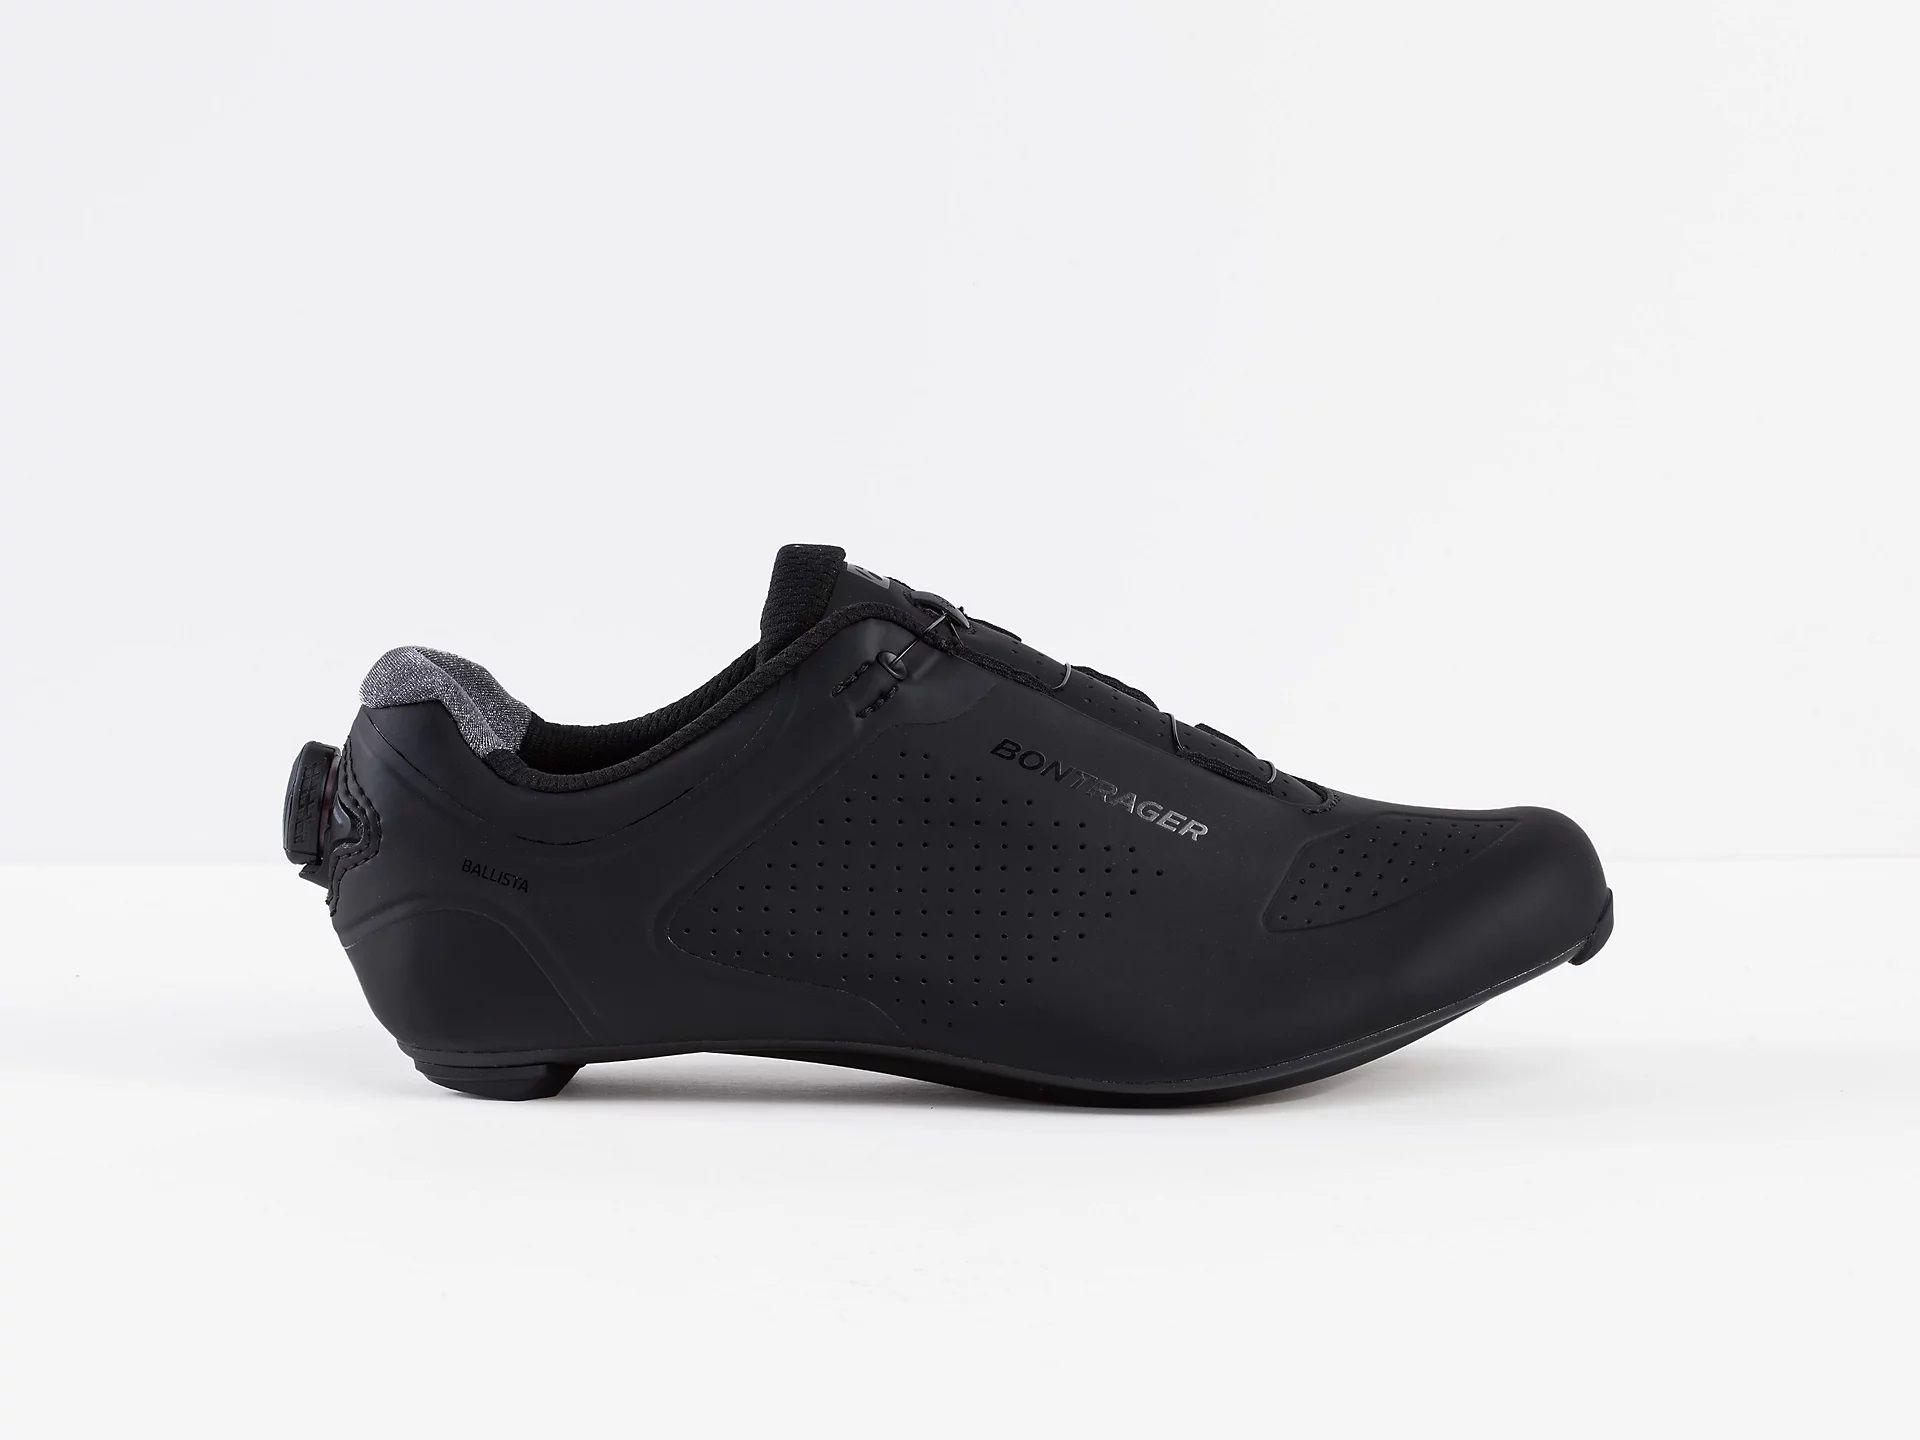 Sapatilha Bontrager Ballista para ciclismo de estrada na cor preto